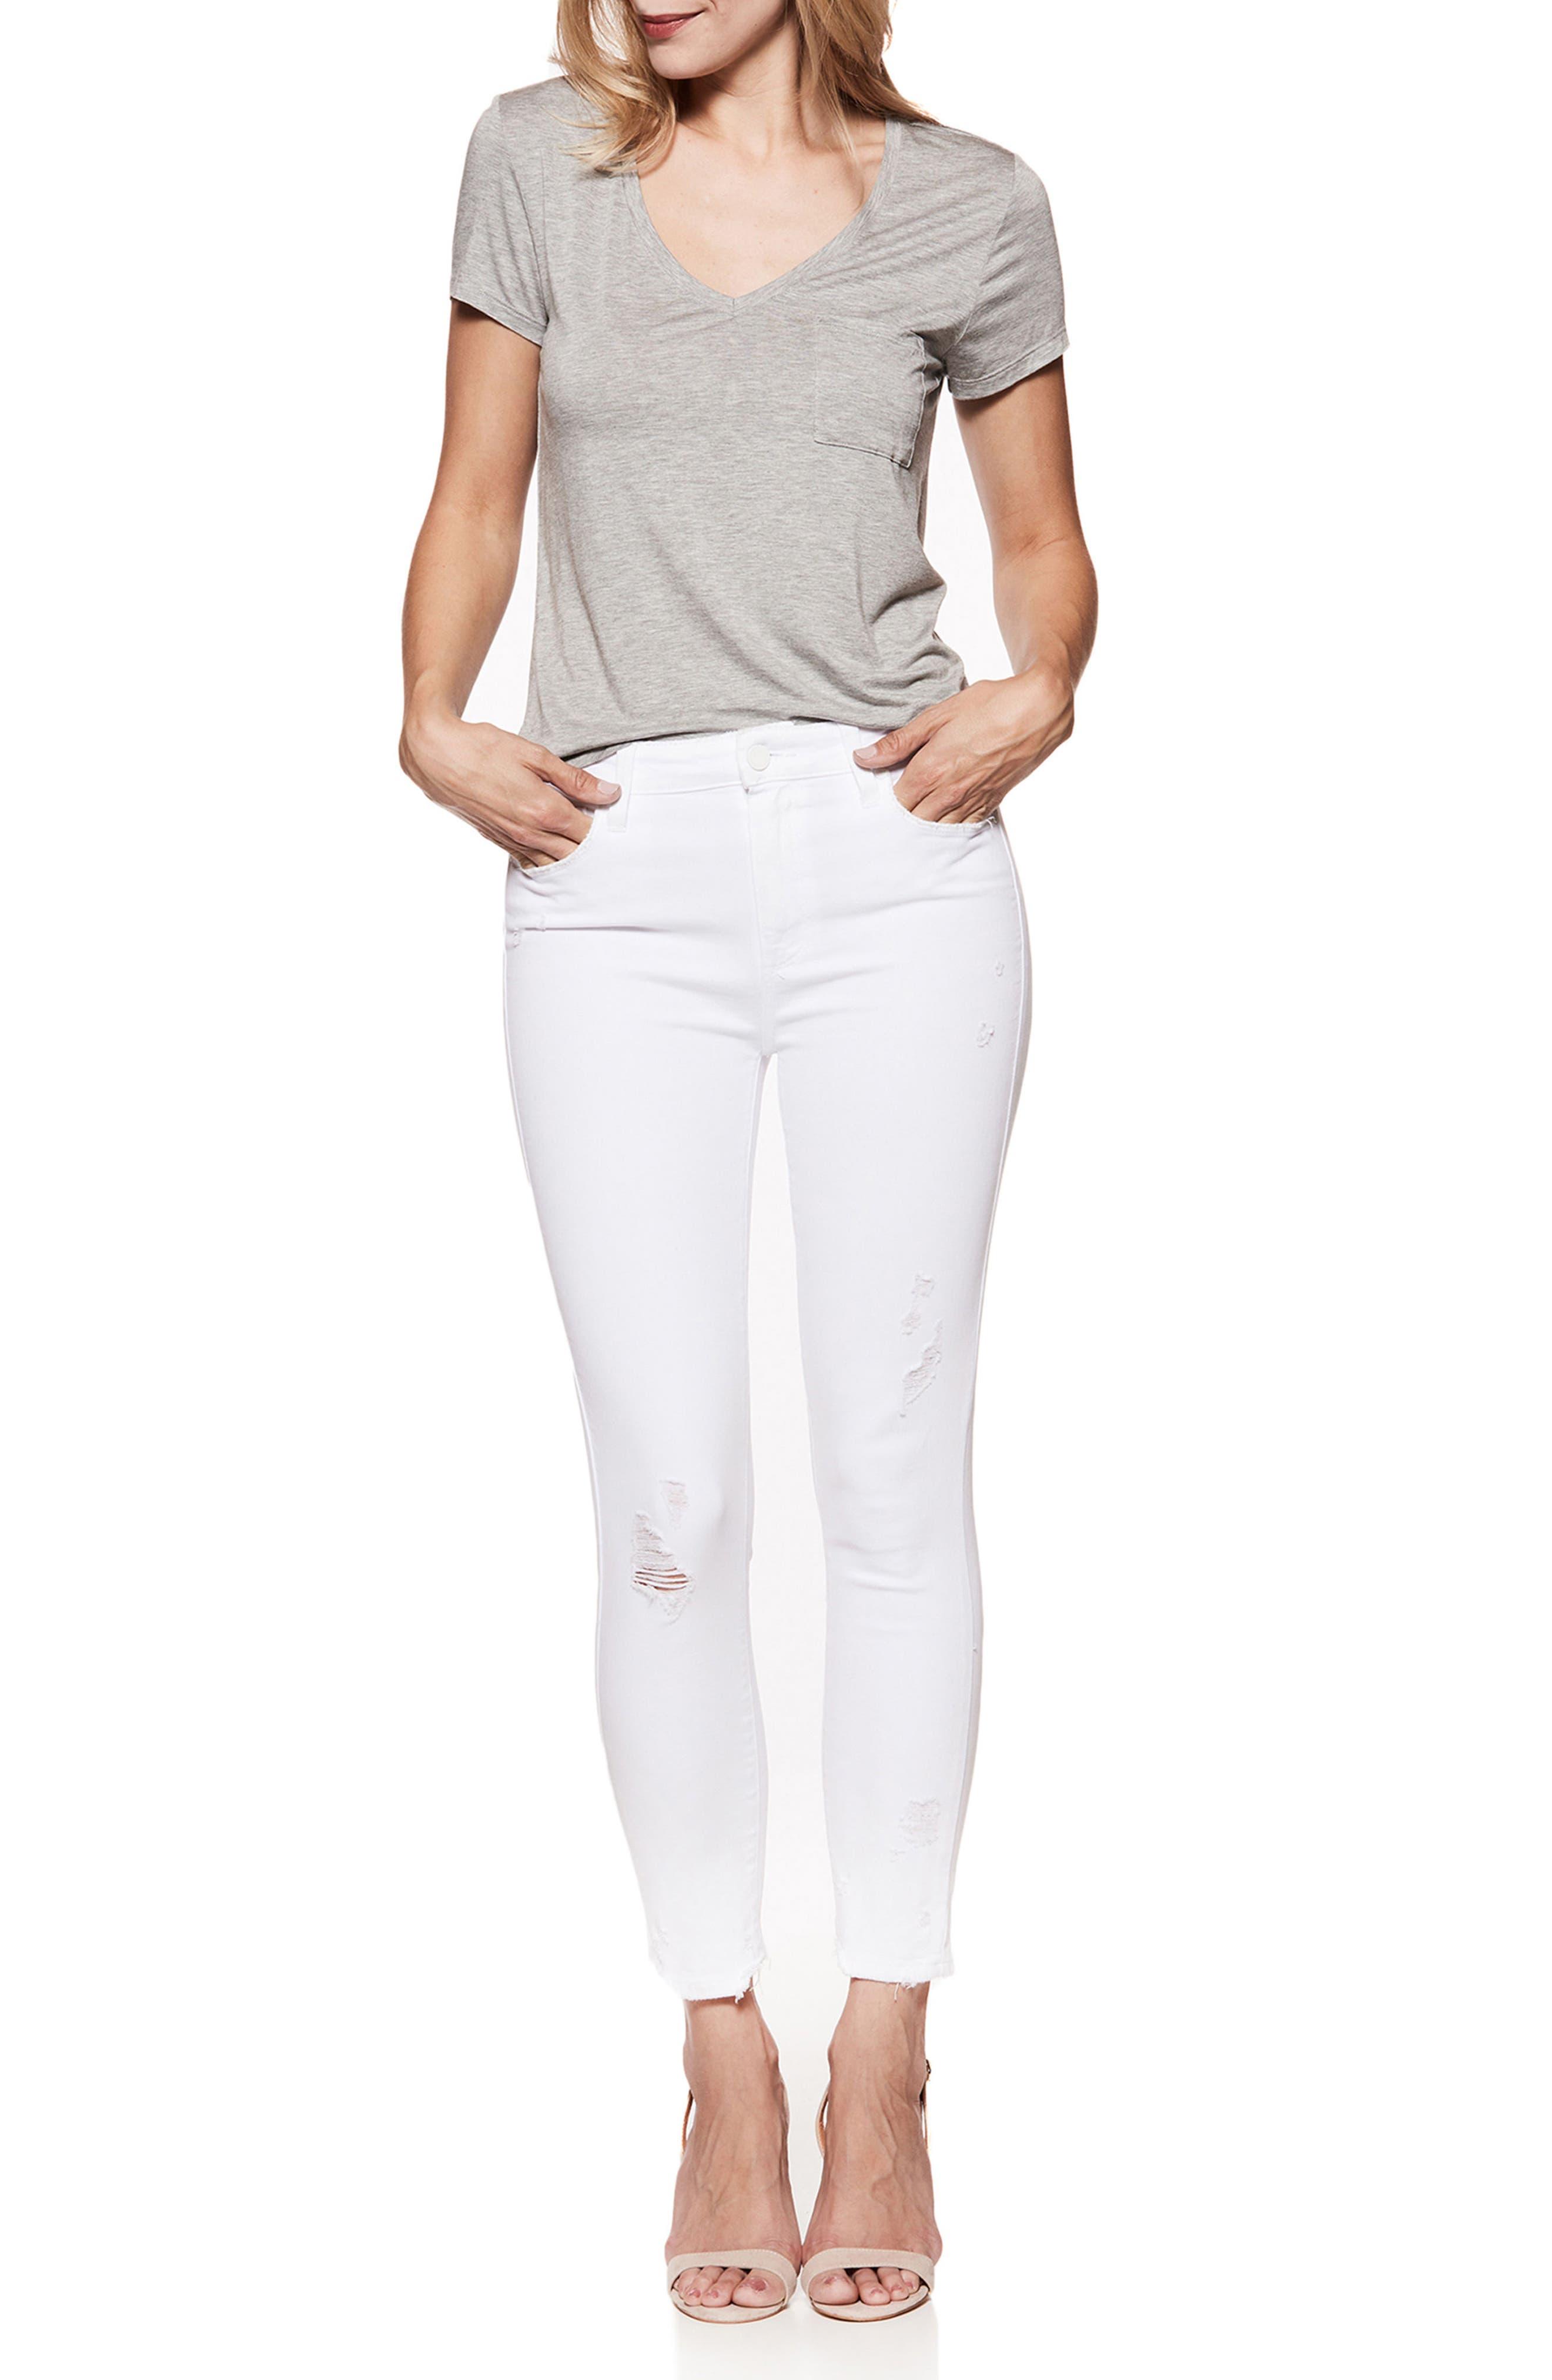 Hoxton High Waist Ankle Skinny Jeans,                             Alternate thumbnail 3, color,                             CRISP WHITE DESTRUCTED